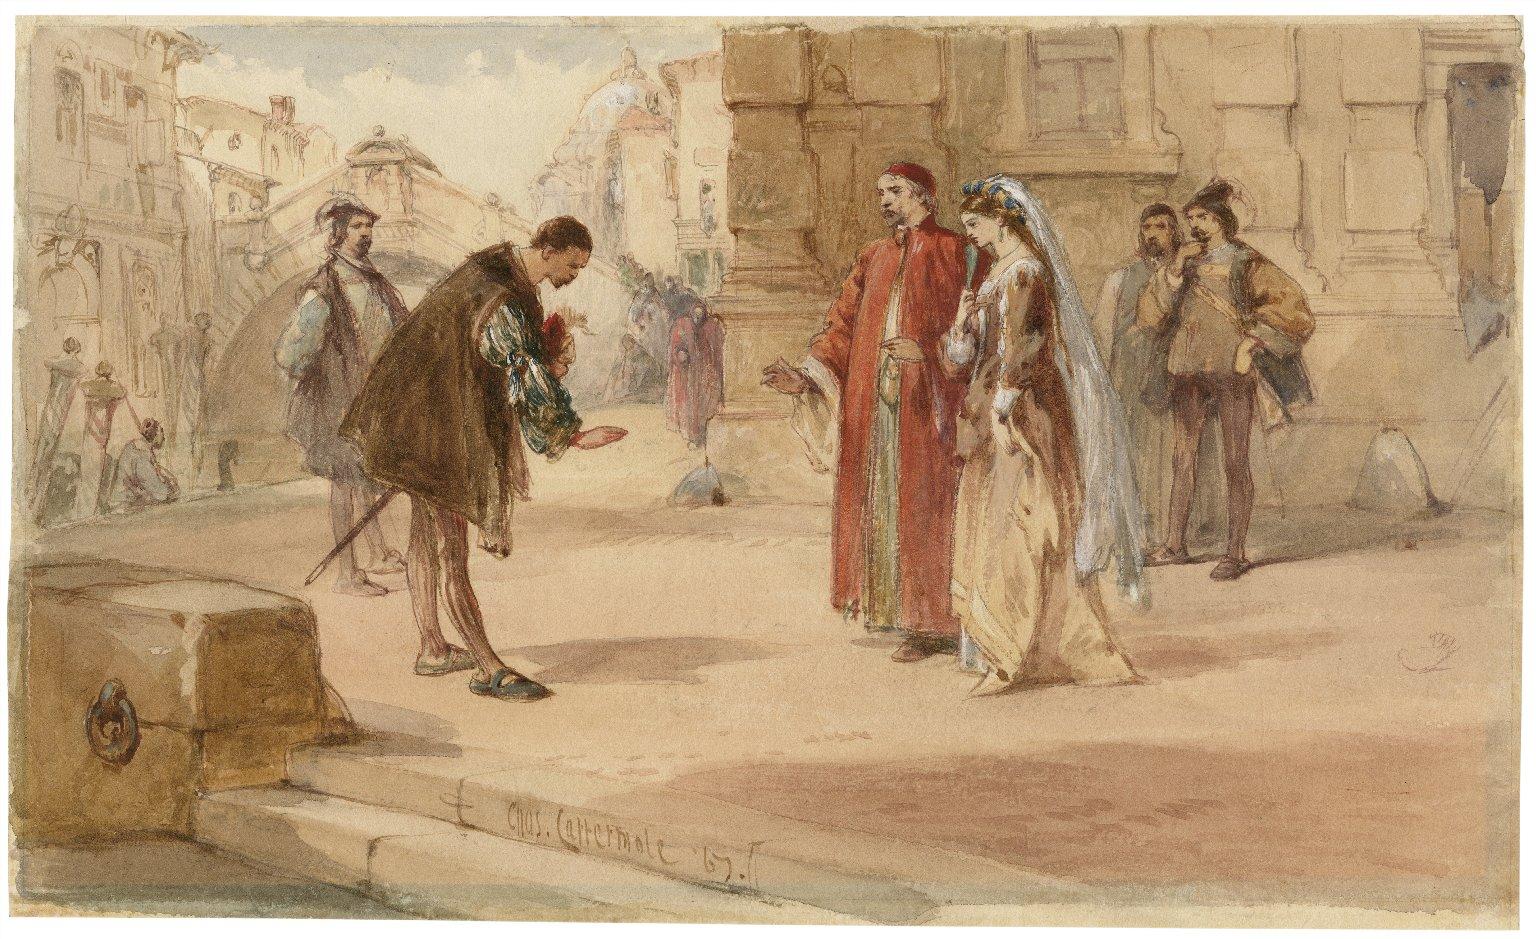 Merchant of Venice, V, 1 [graphic] / Chas. Cattermole.